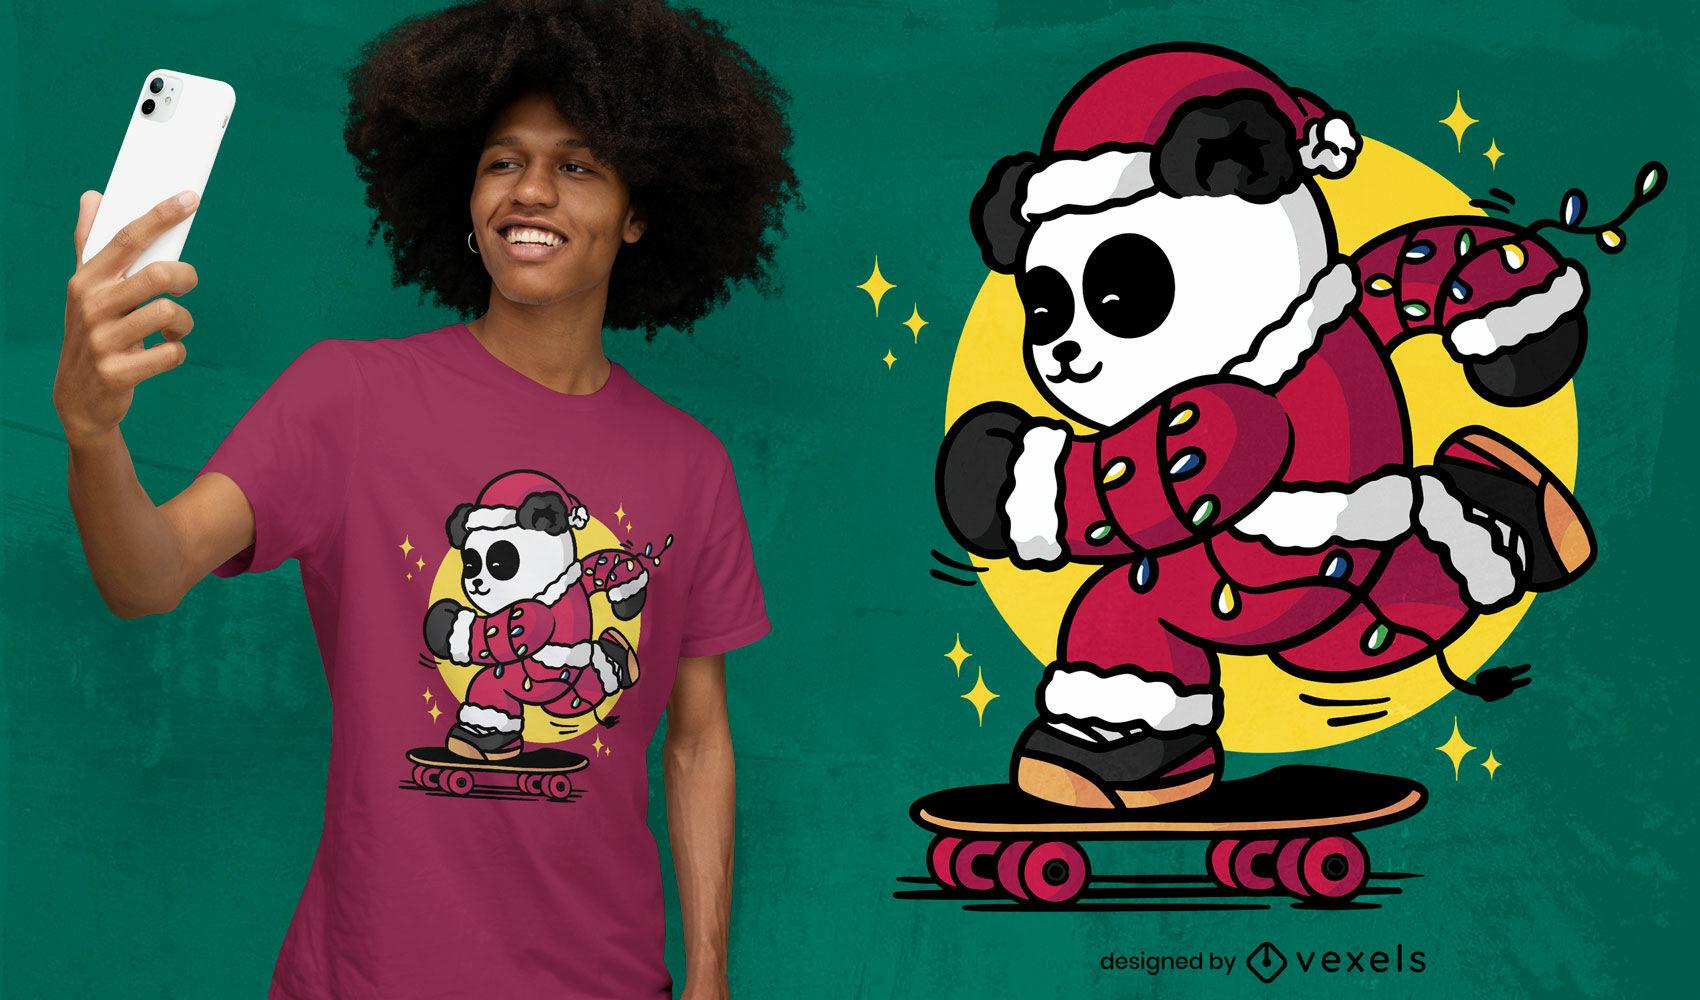 Skating santa panda t-shirt design